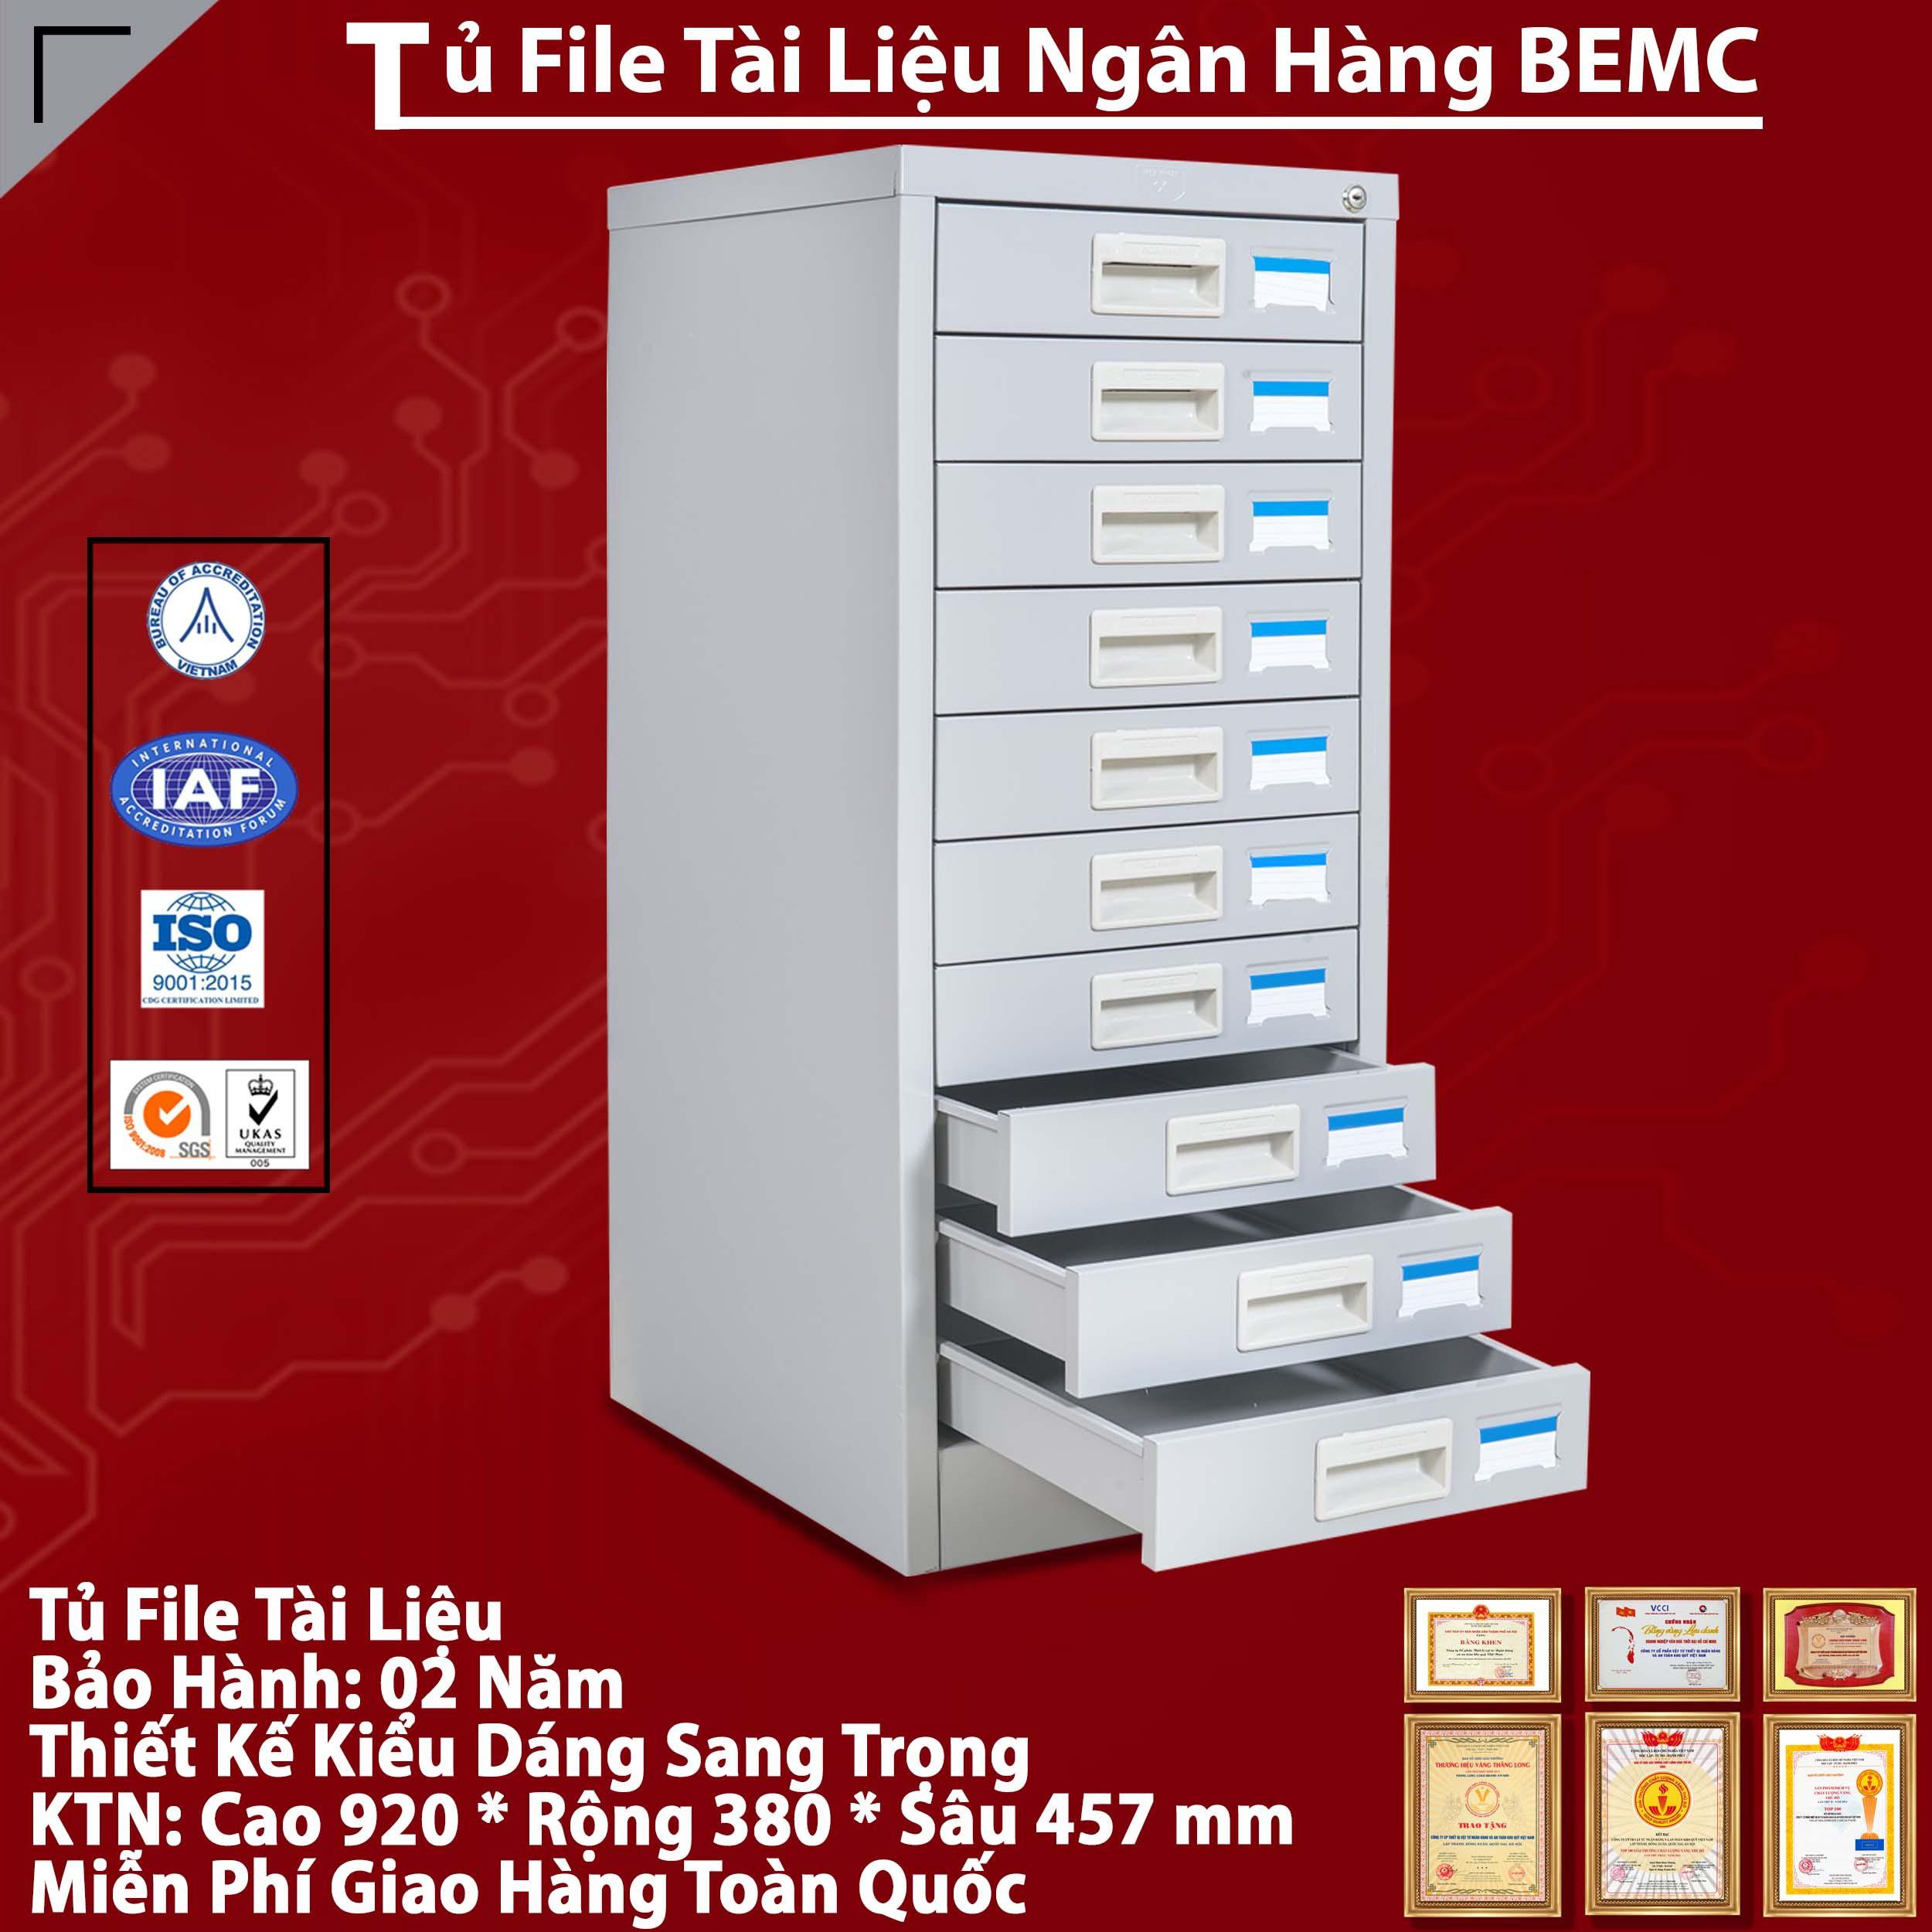 Nhà Cung Cấp Tủ Sắt Để FILE Tài Liệu BEMC - 10F